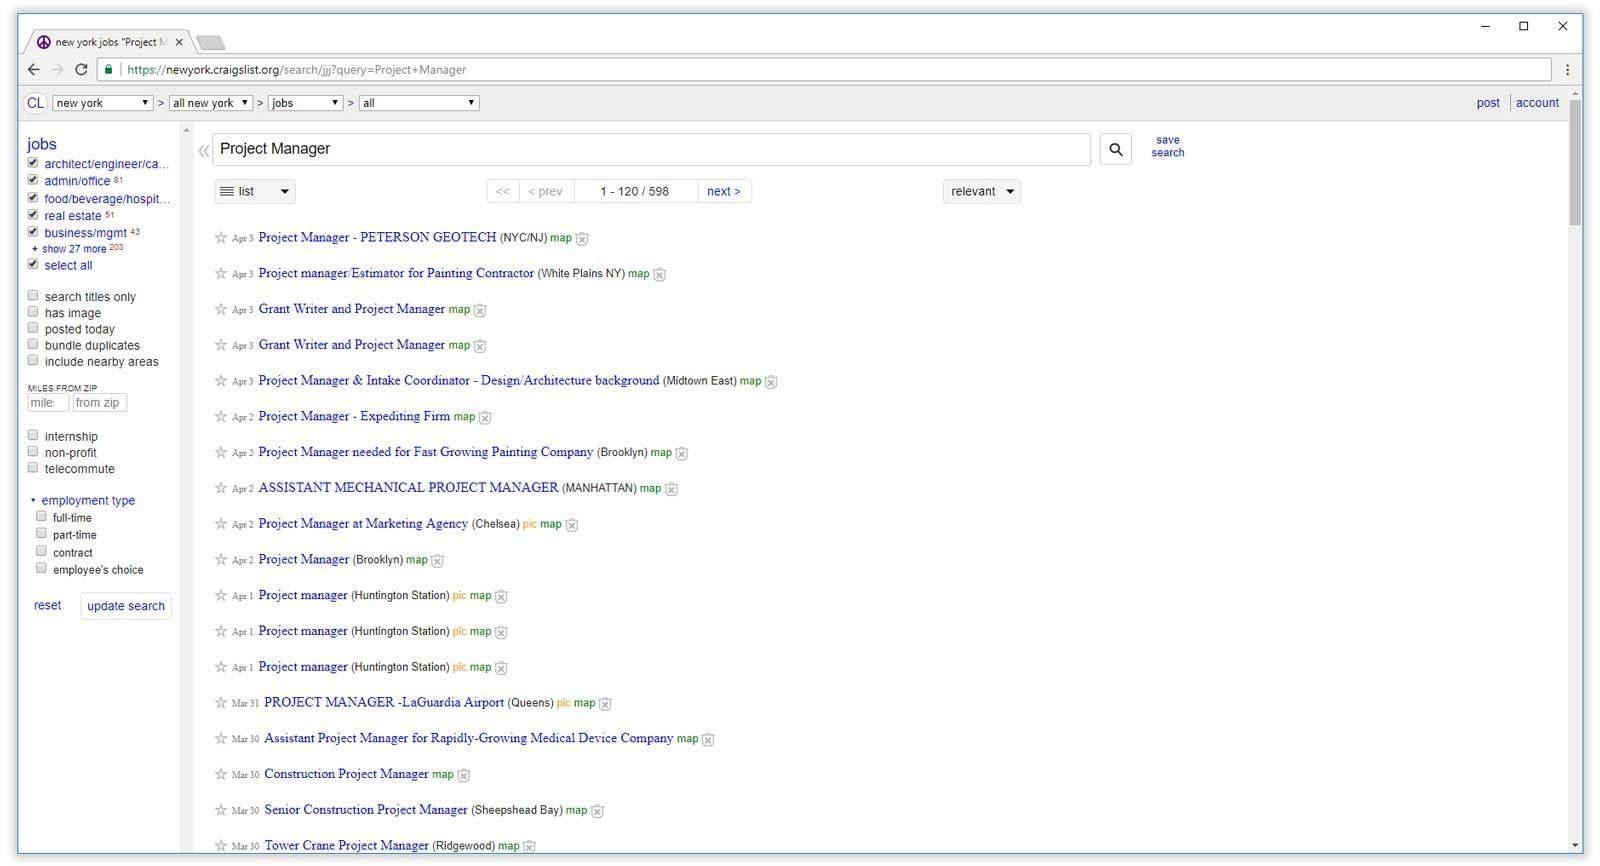 craigslist_job_search_results-2671511